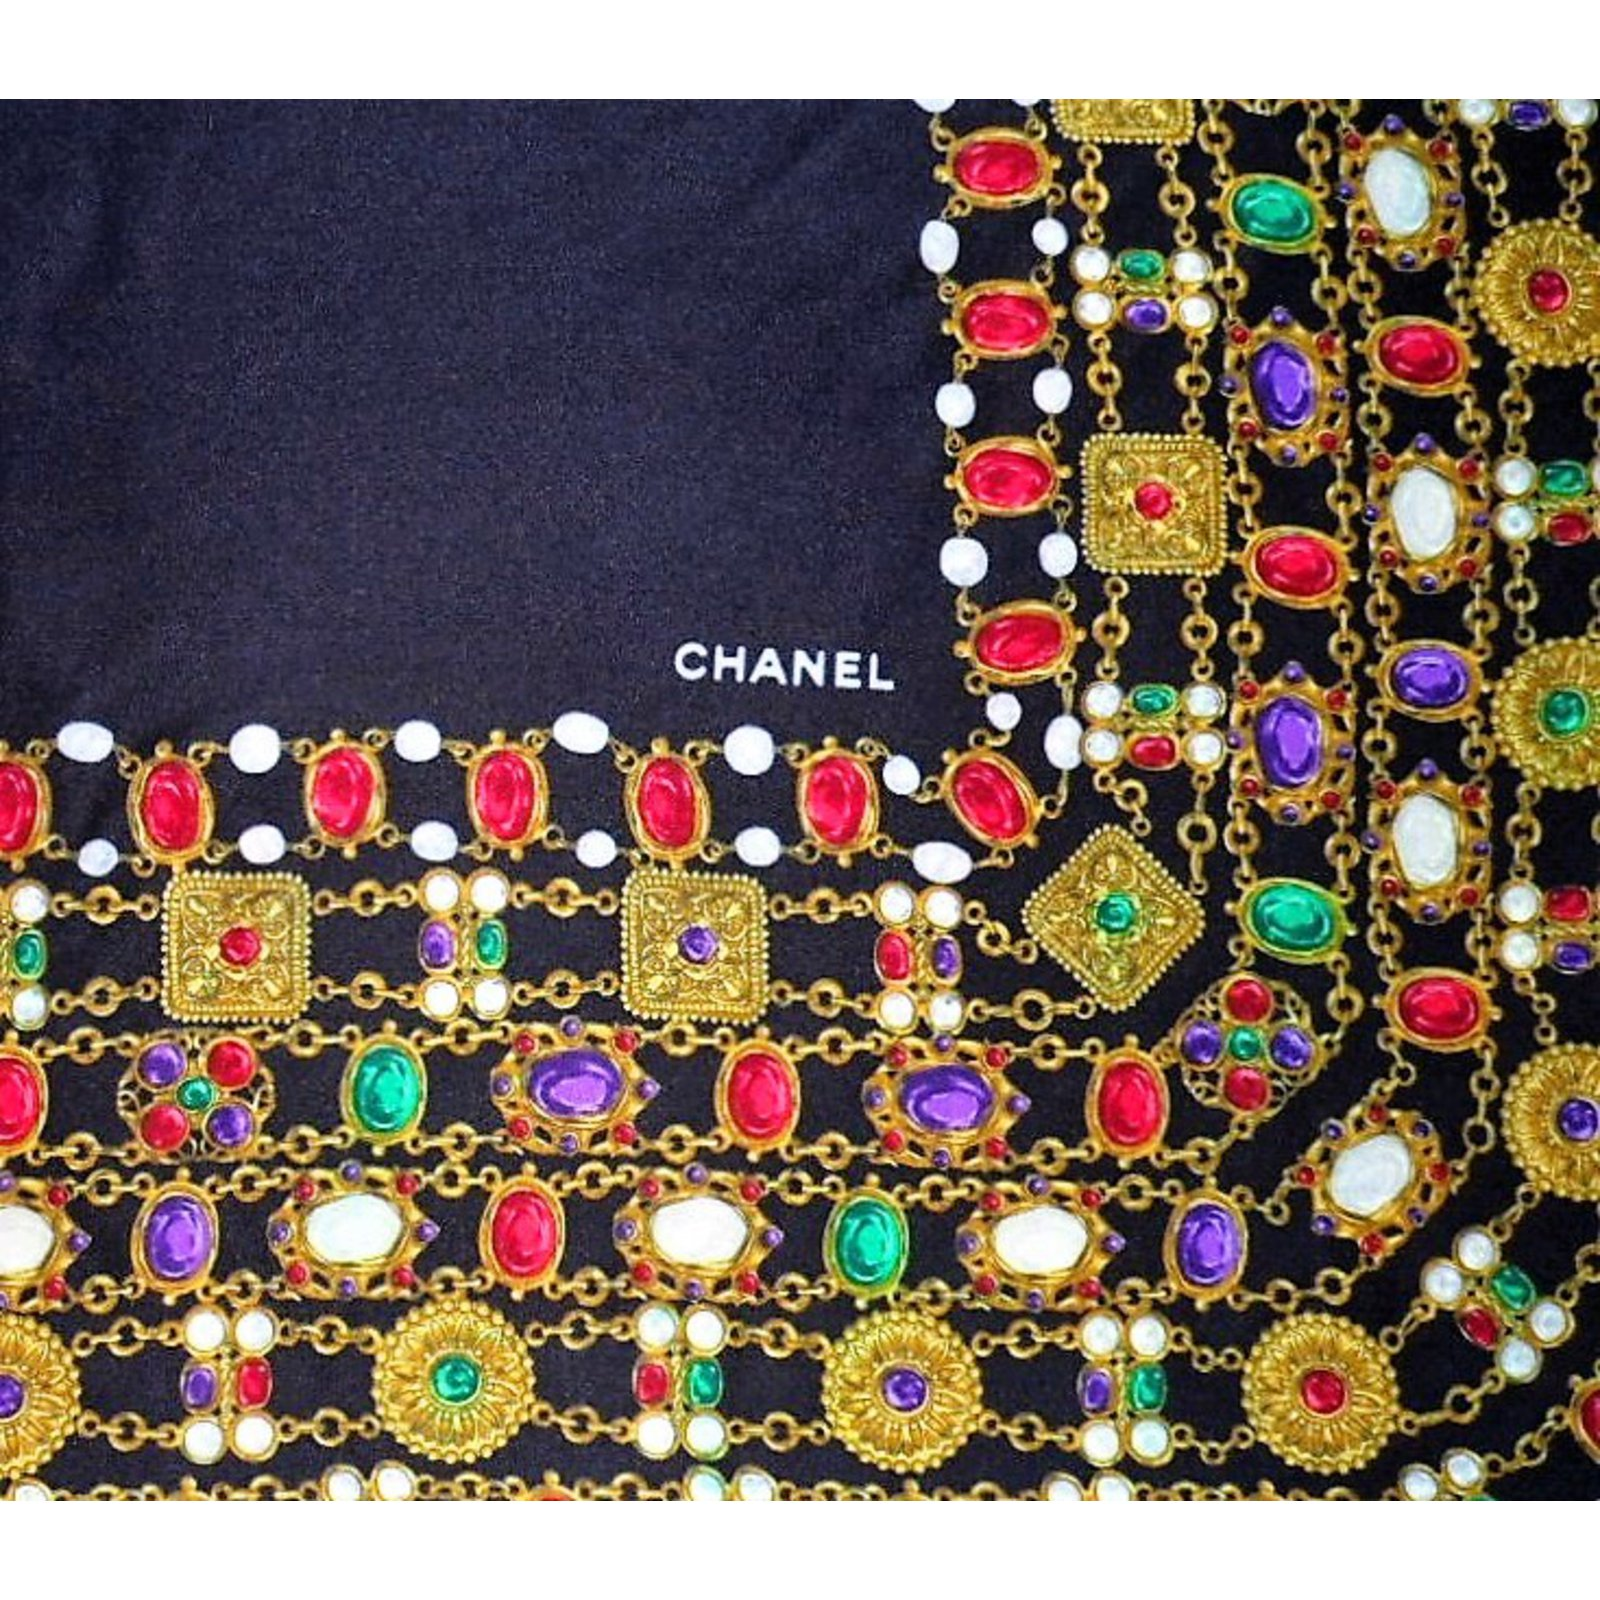 Chanel CHANEL Vintage Gripoix Jewel Print Silk Scarf Silk Scarves Silk  Multiple Colors Ref.58615   Joli Closet